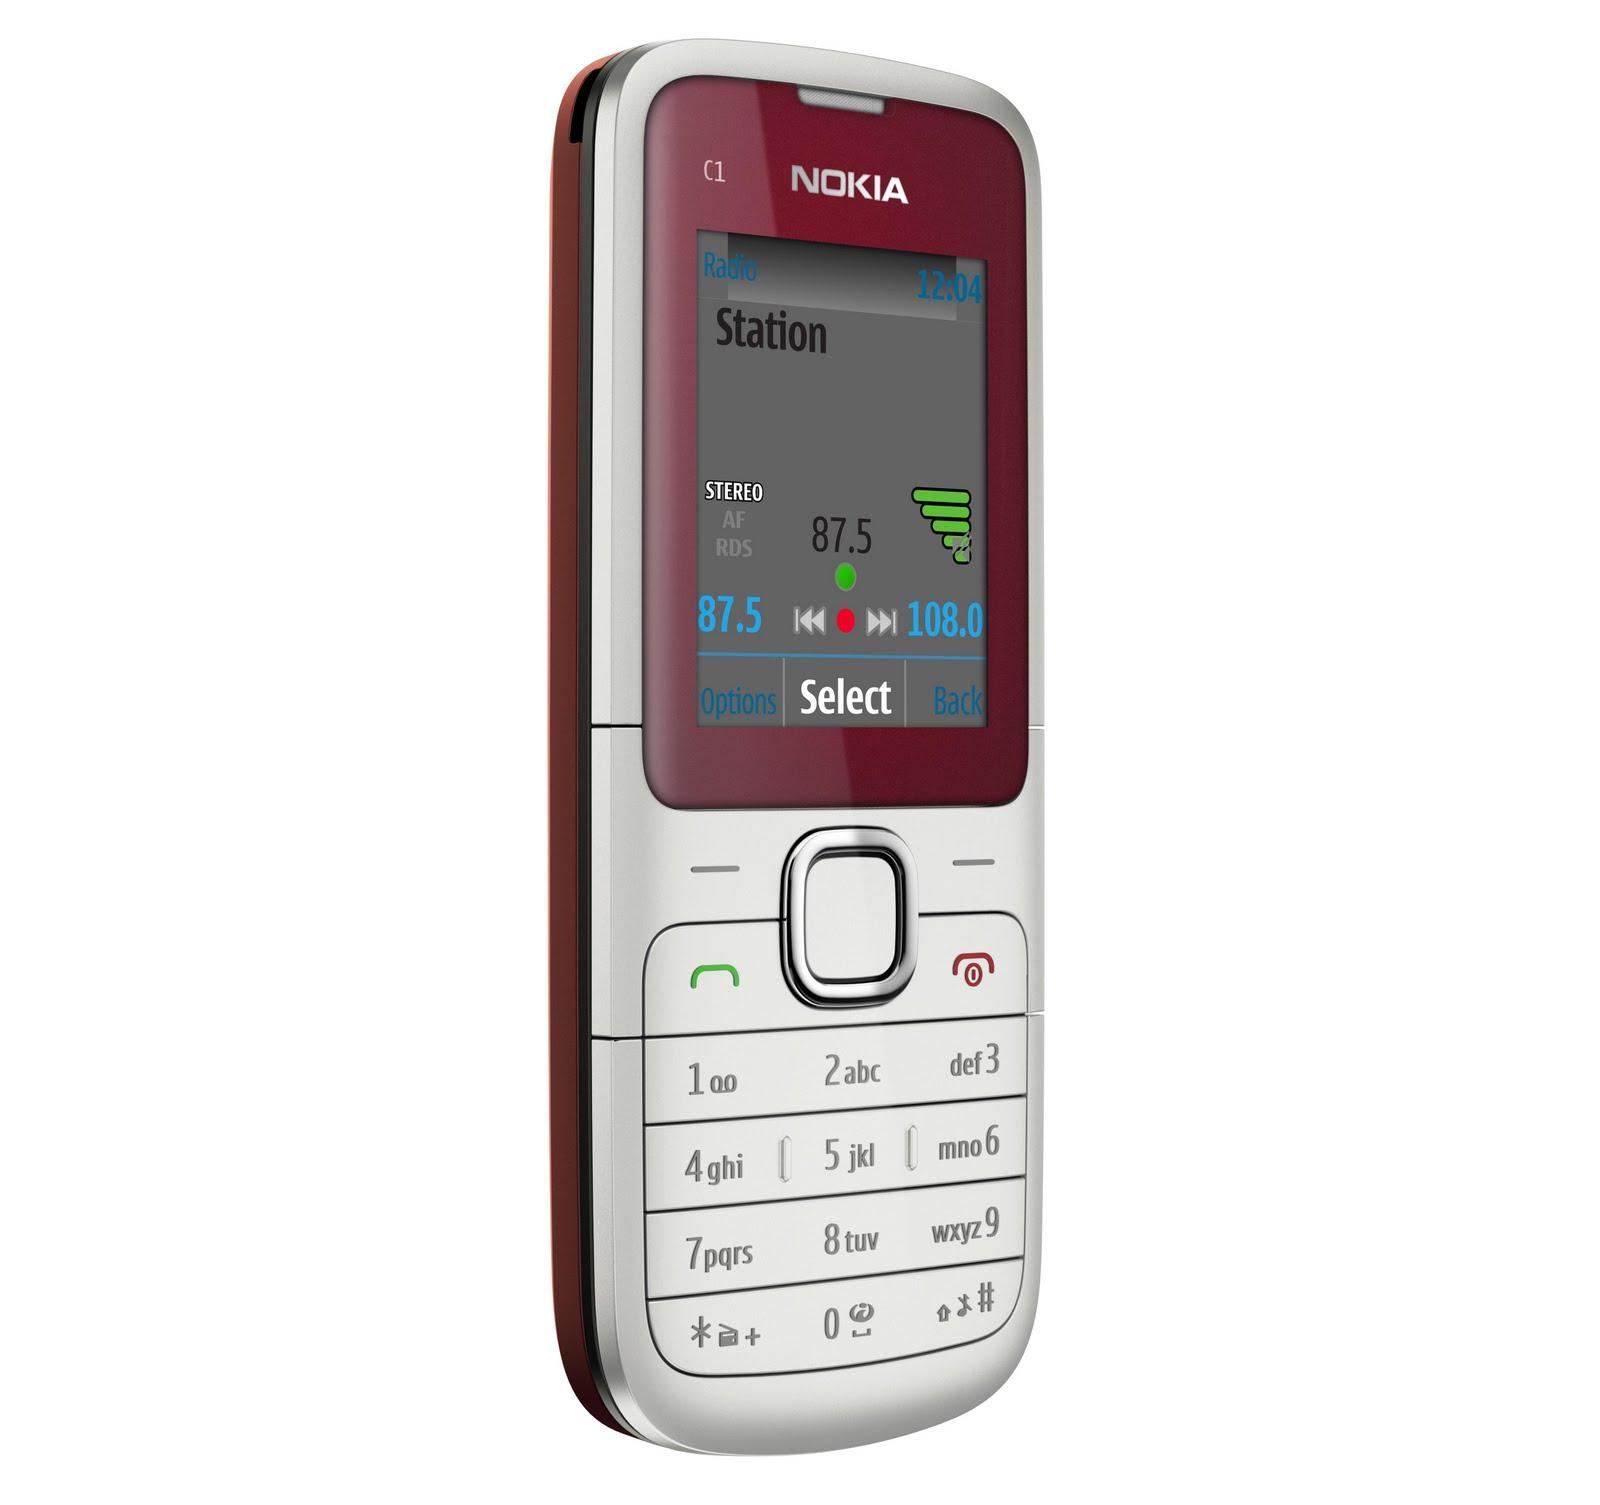 http://1.bp.blogspot.com/-My2HGWuICjM/TmthovC6WdI/AAAAAAAAACQ/nG_vCJIe2l0/s1600/Nokia-C1-C1-01.jpg